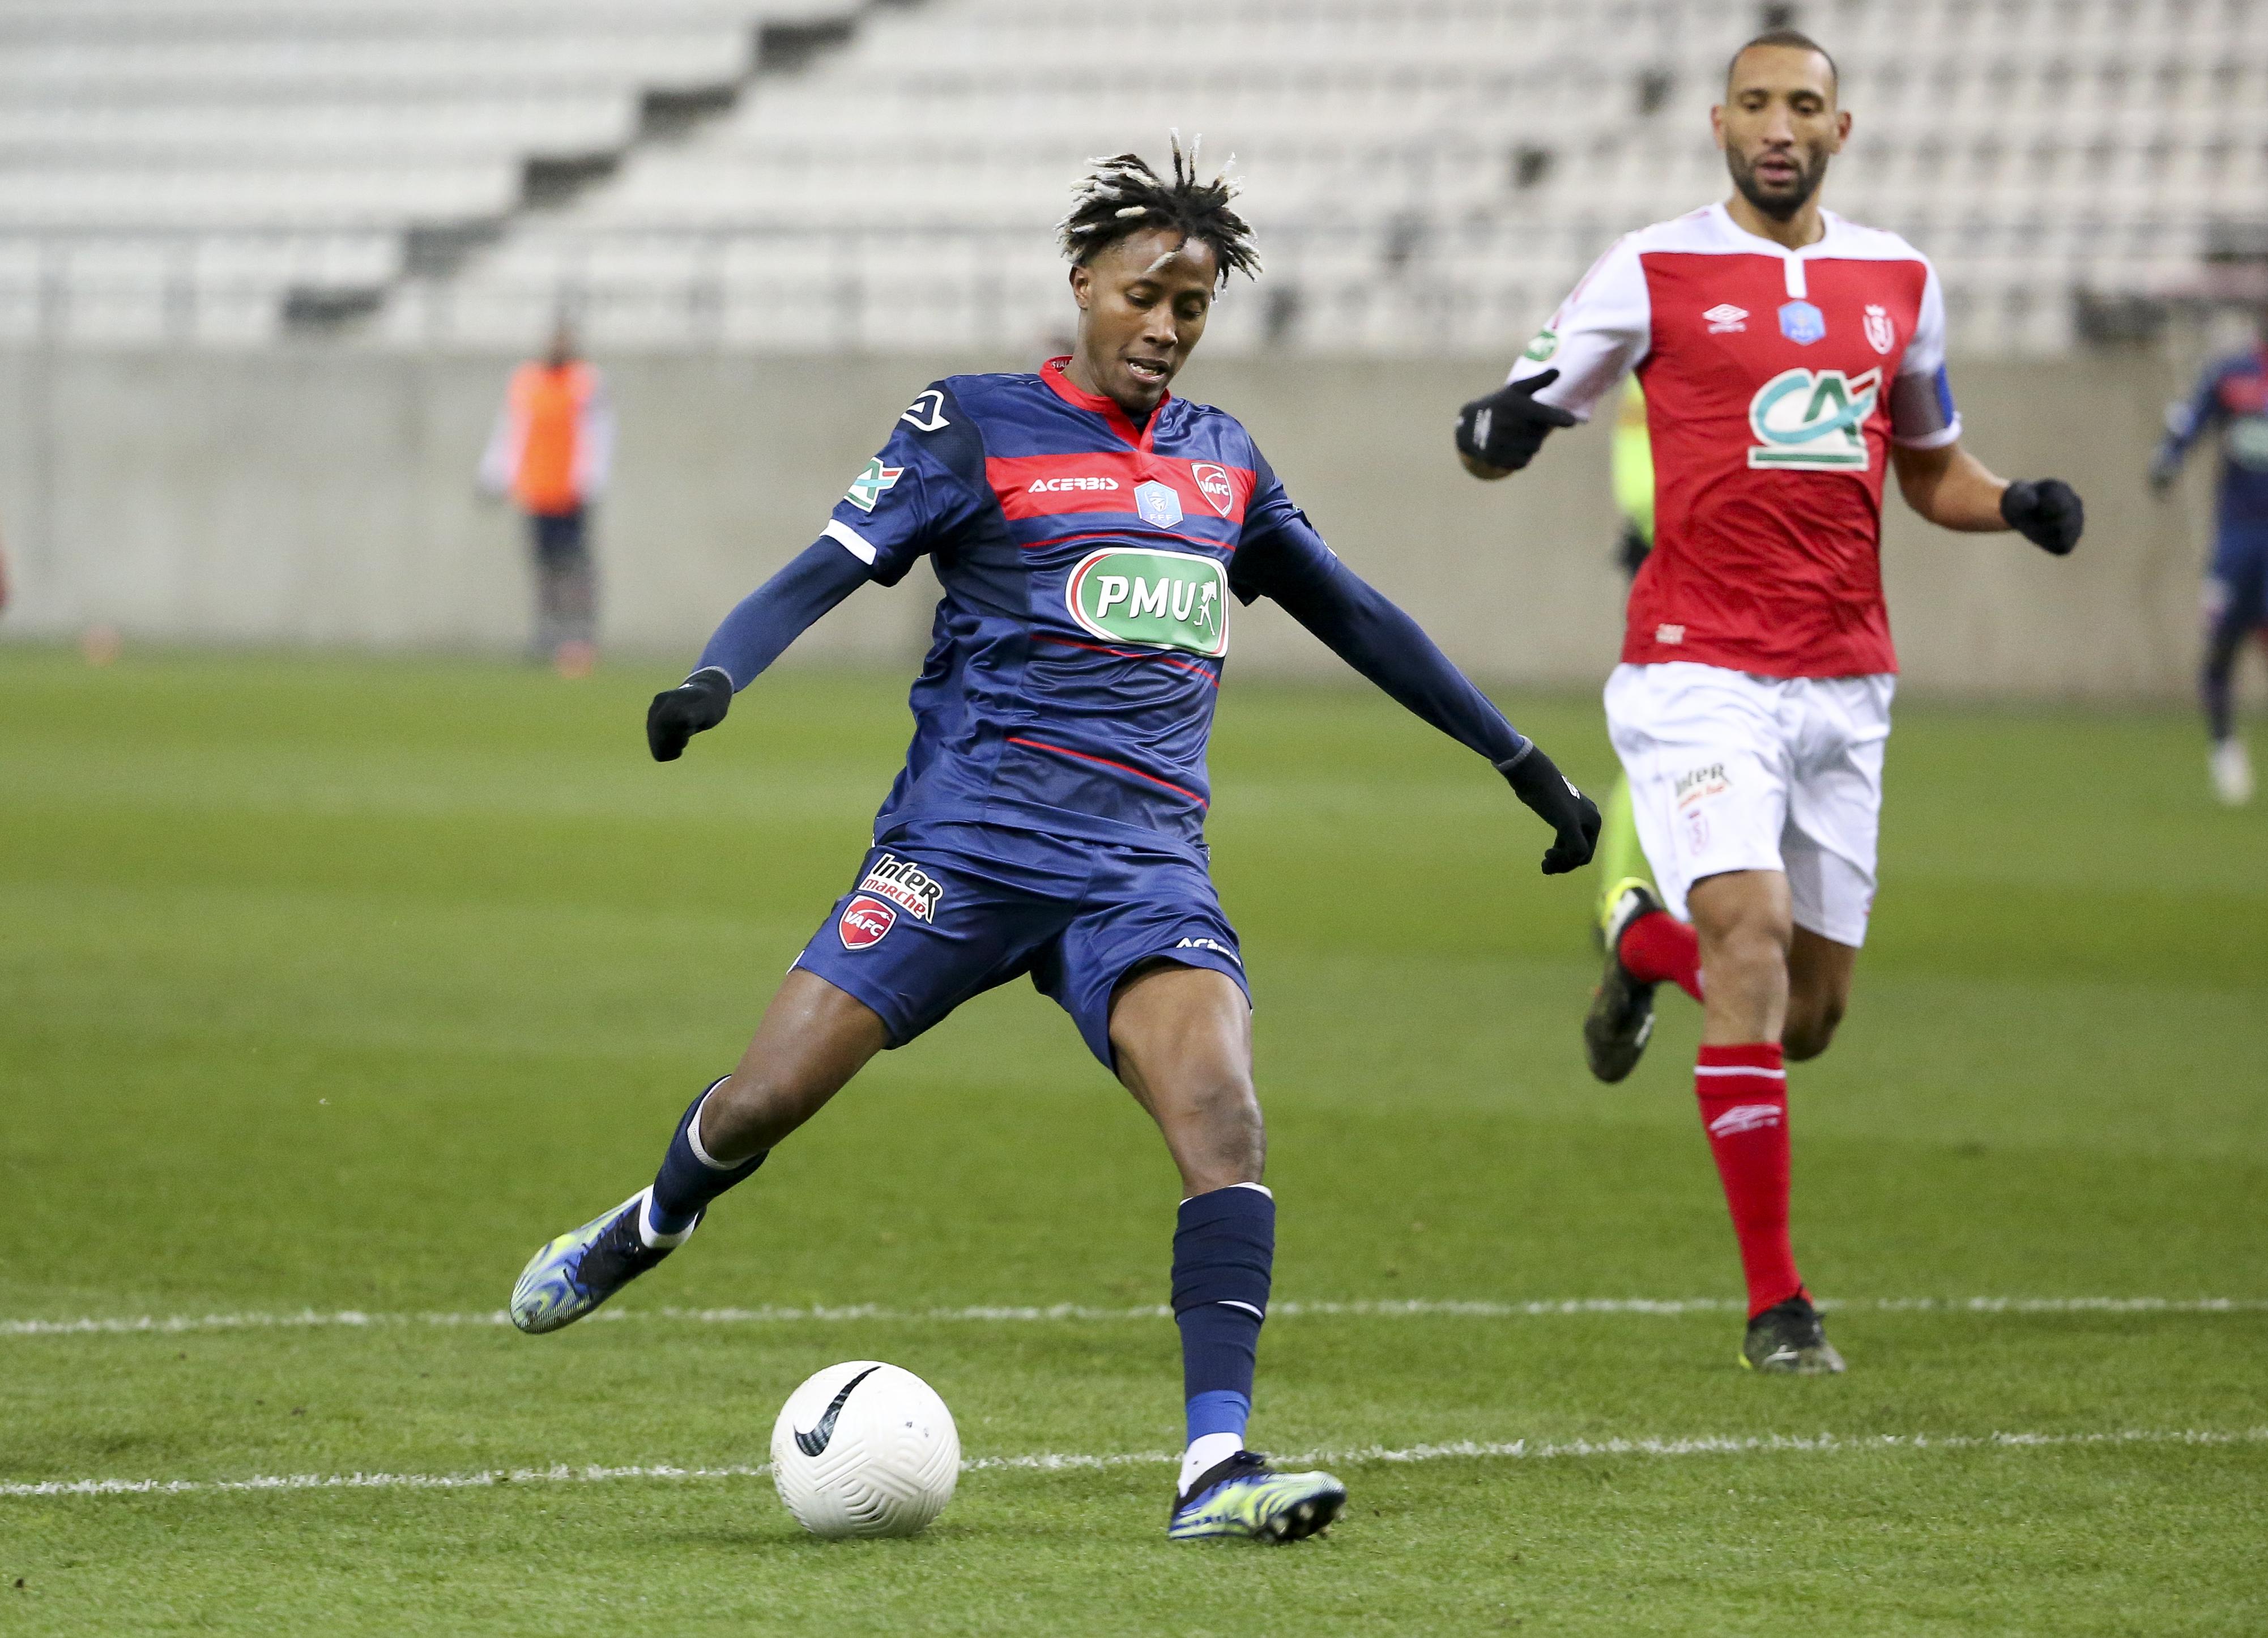 Stade de Reims v Valenciennes FC - French Cup